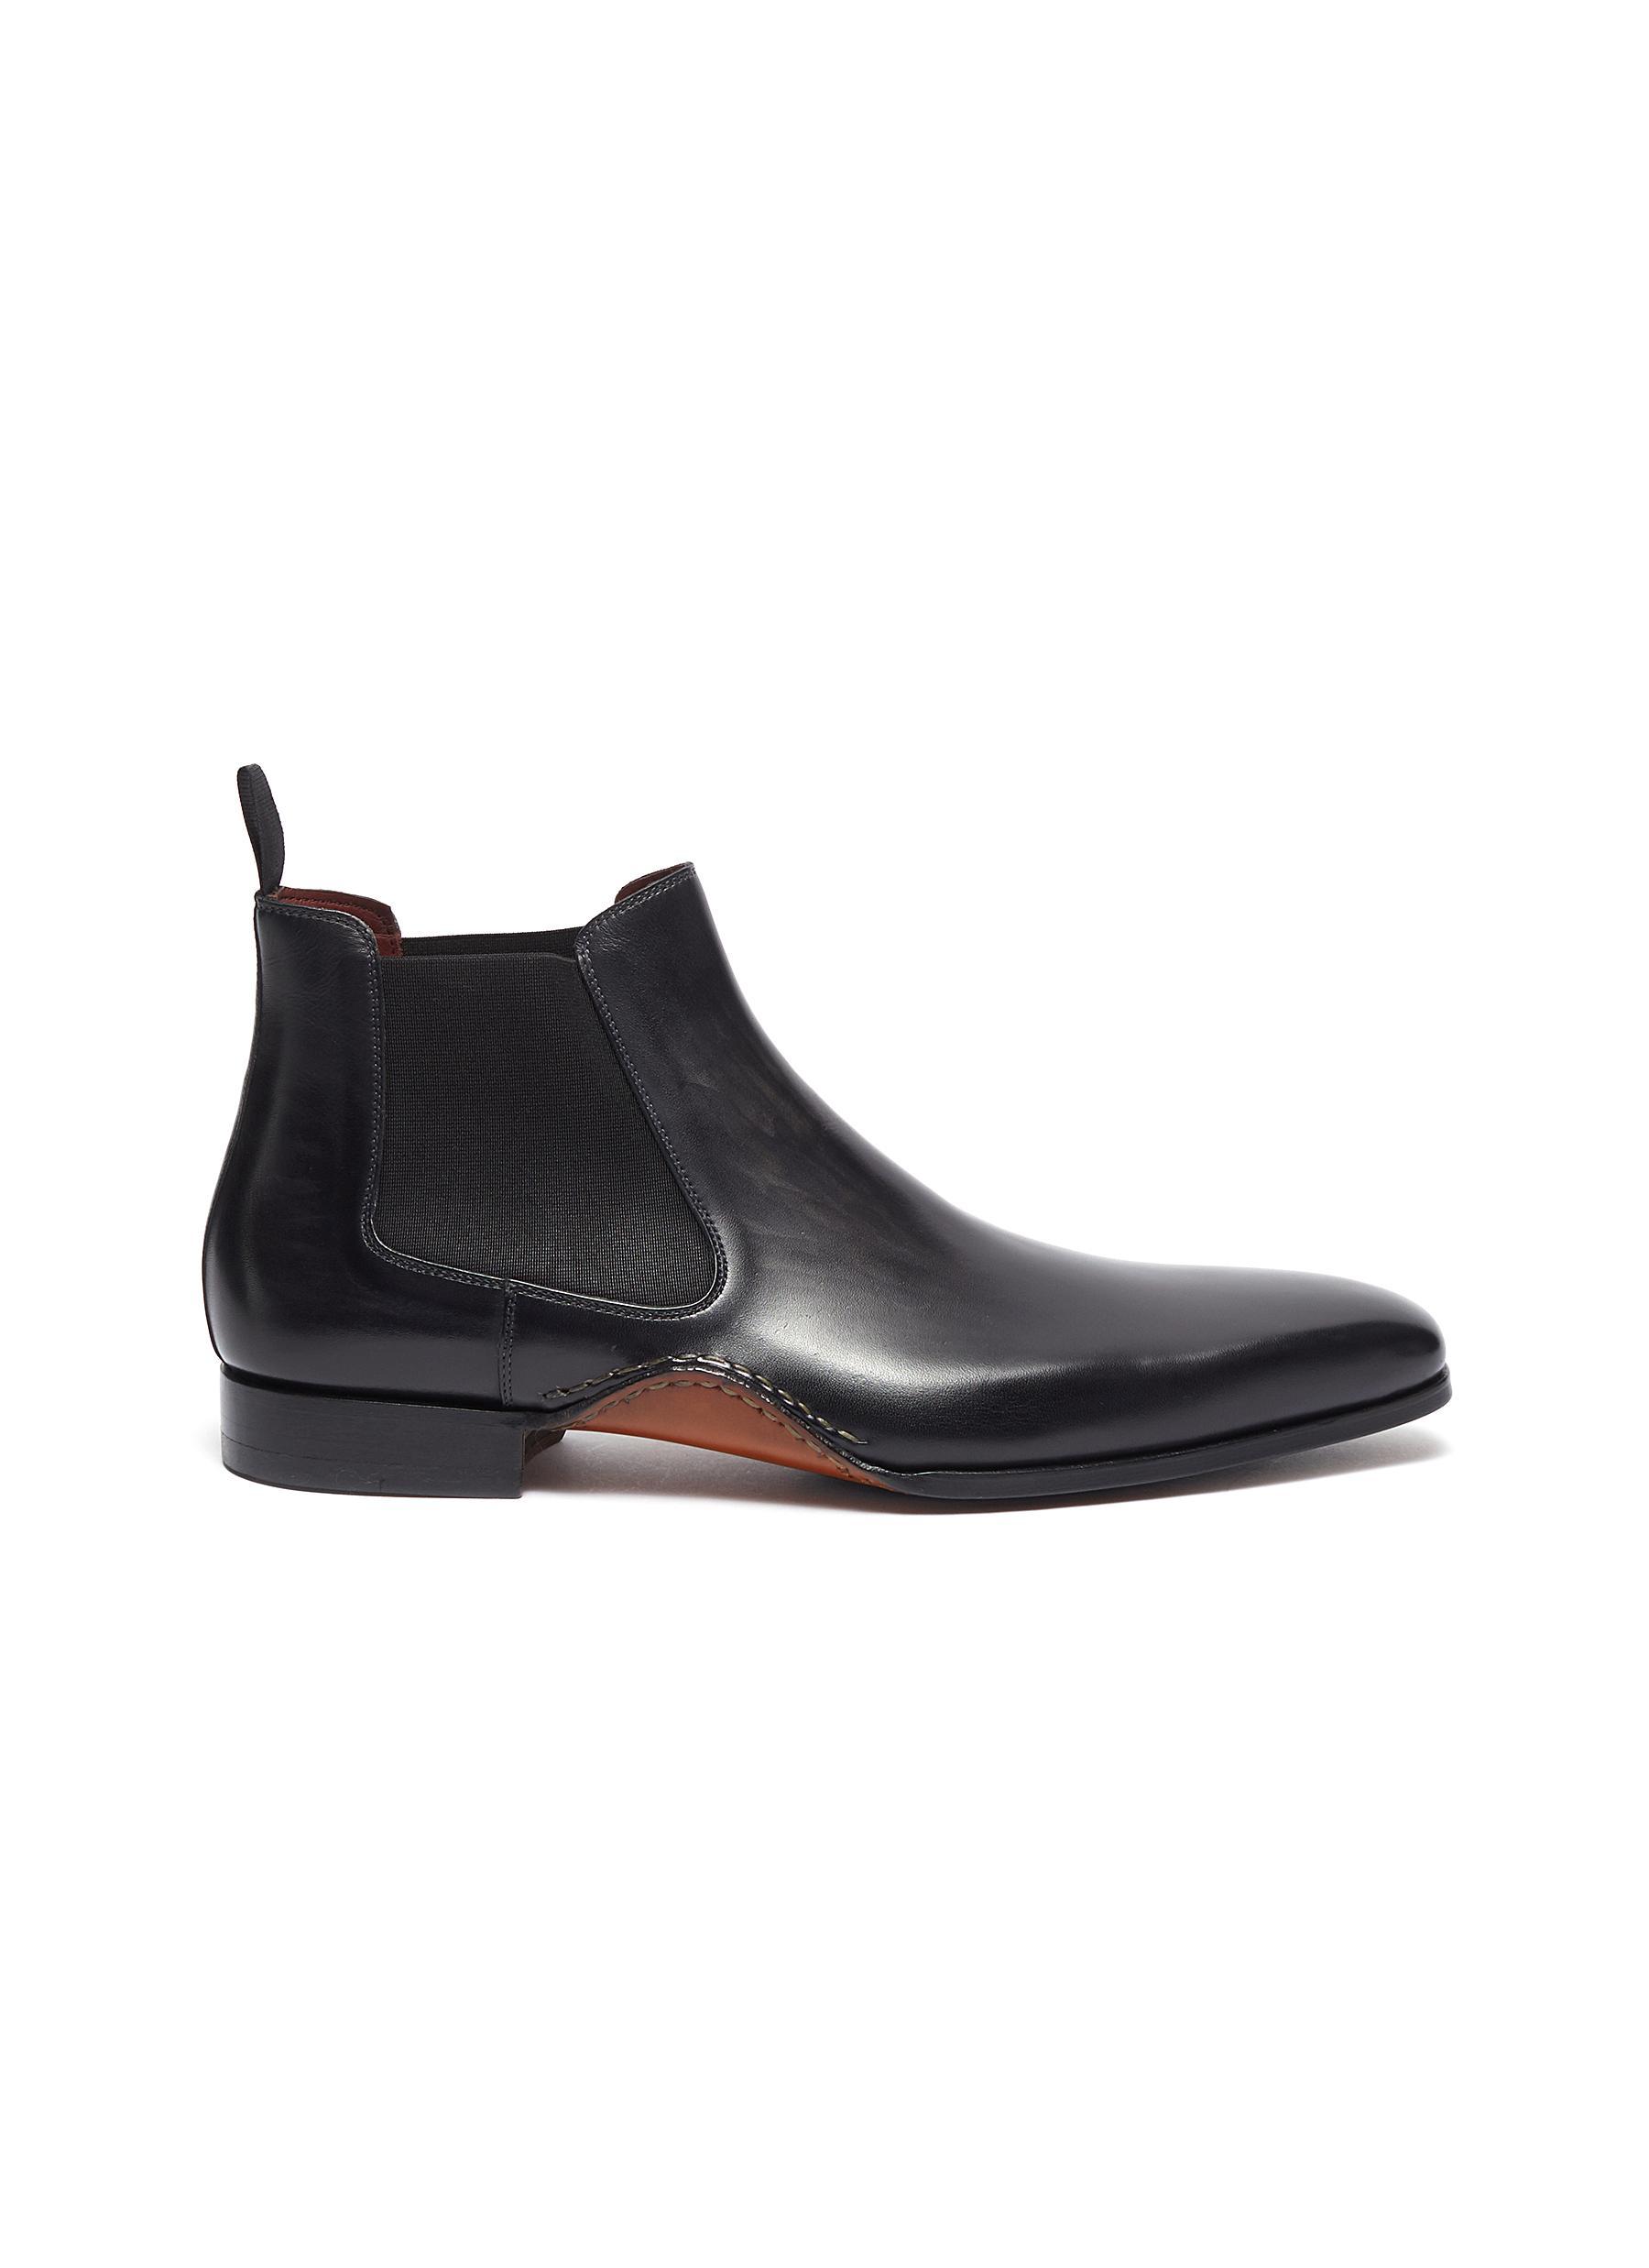 Opanca Chelsea boots - MAGNANNI - Modalova